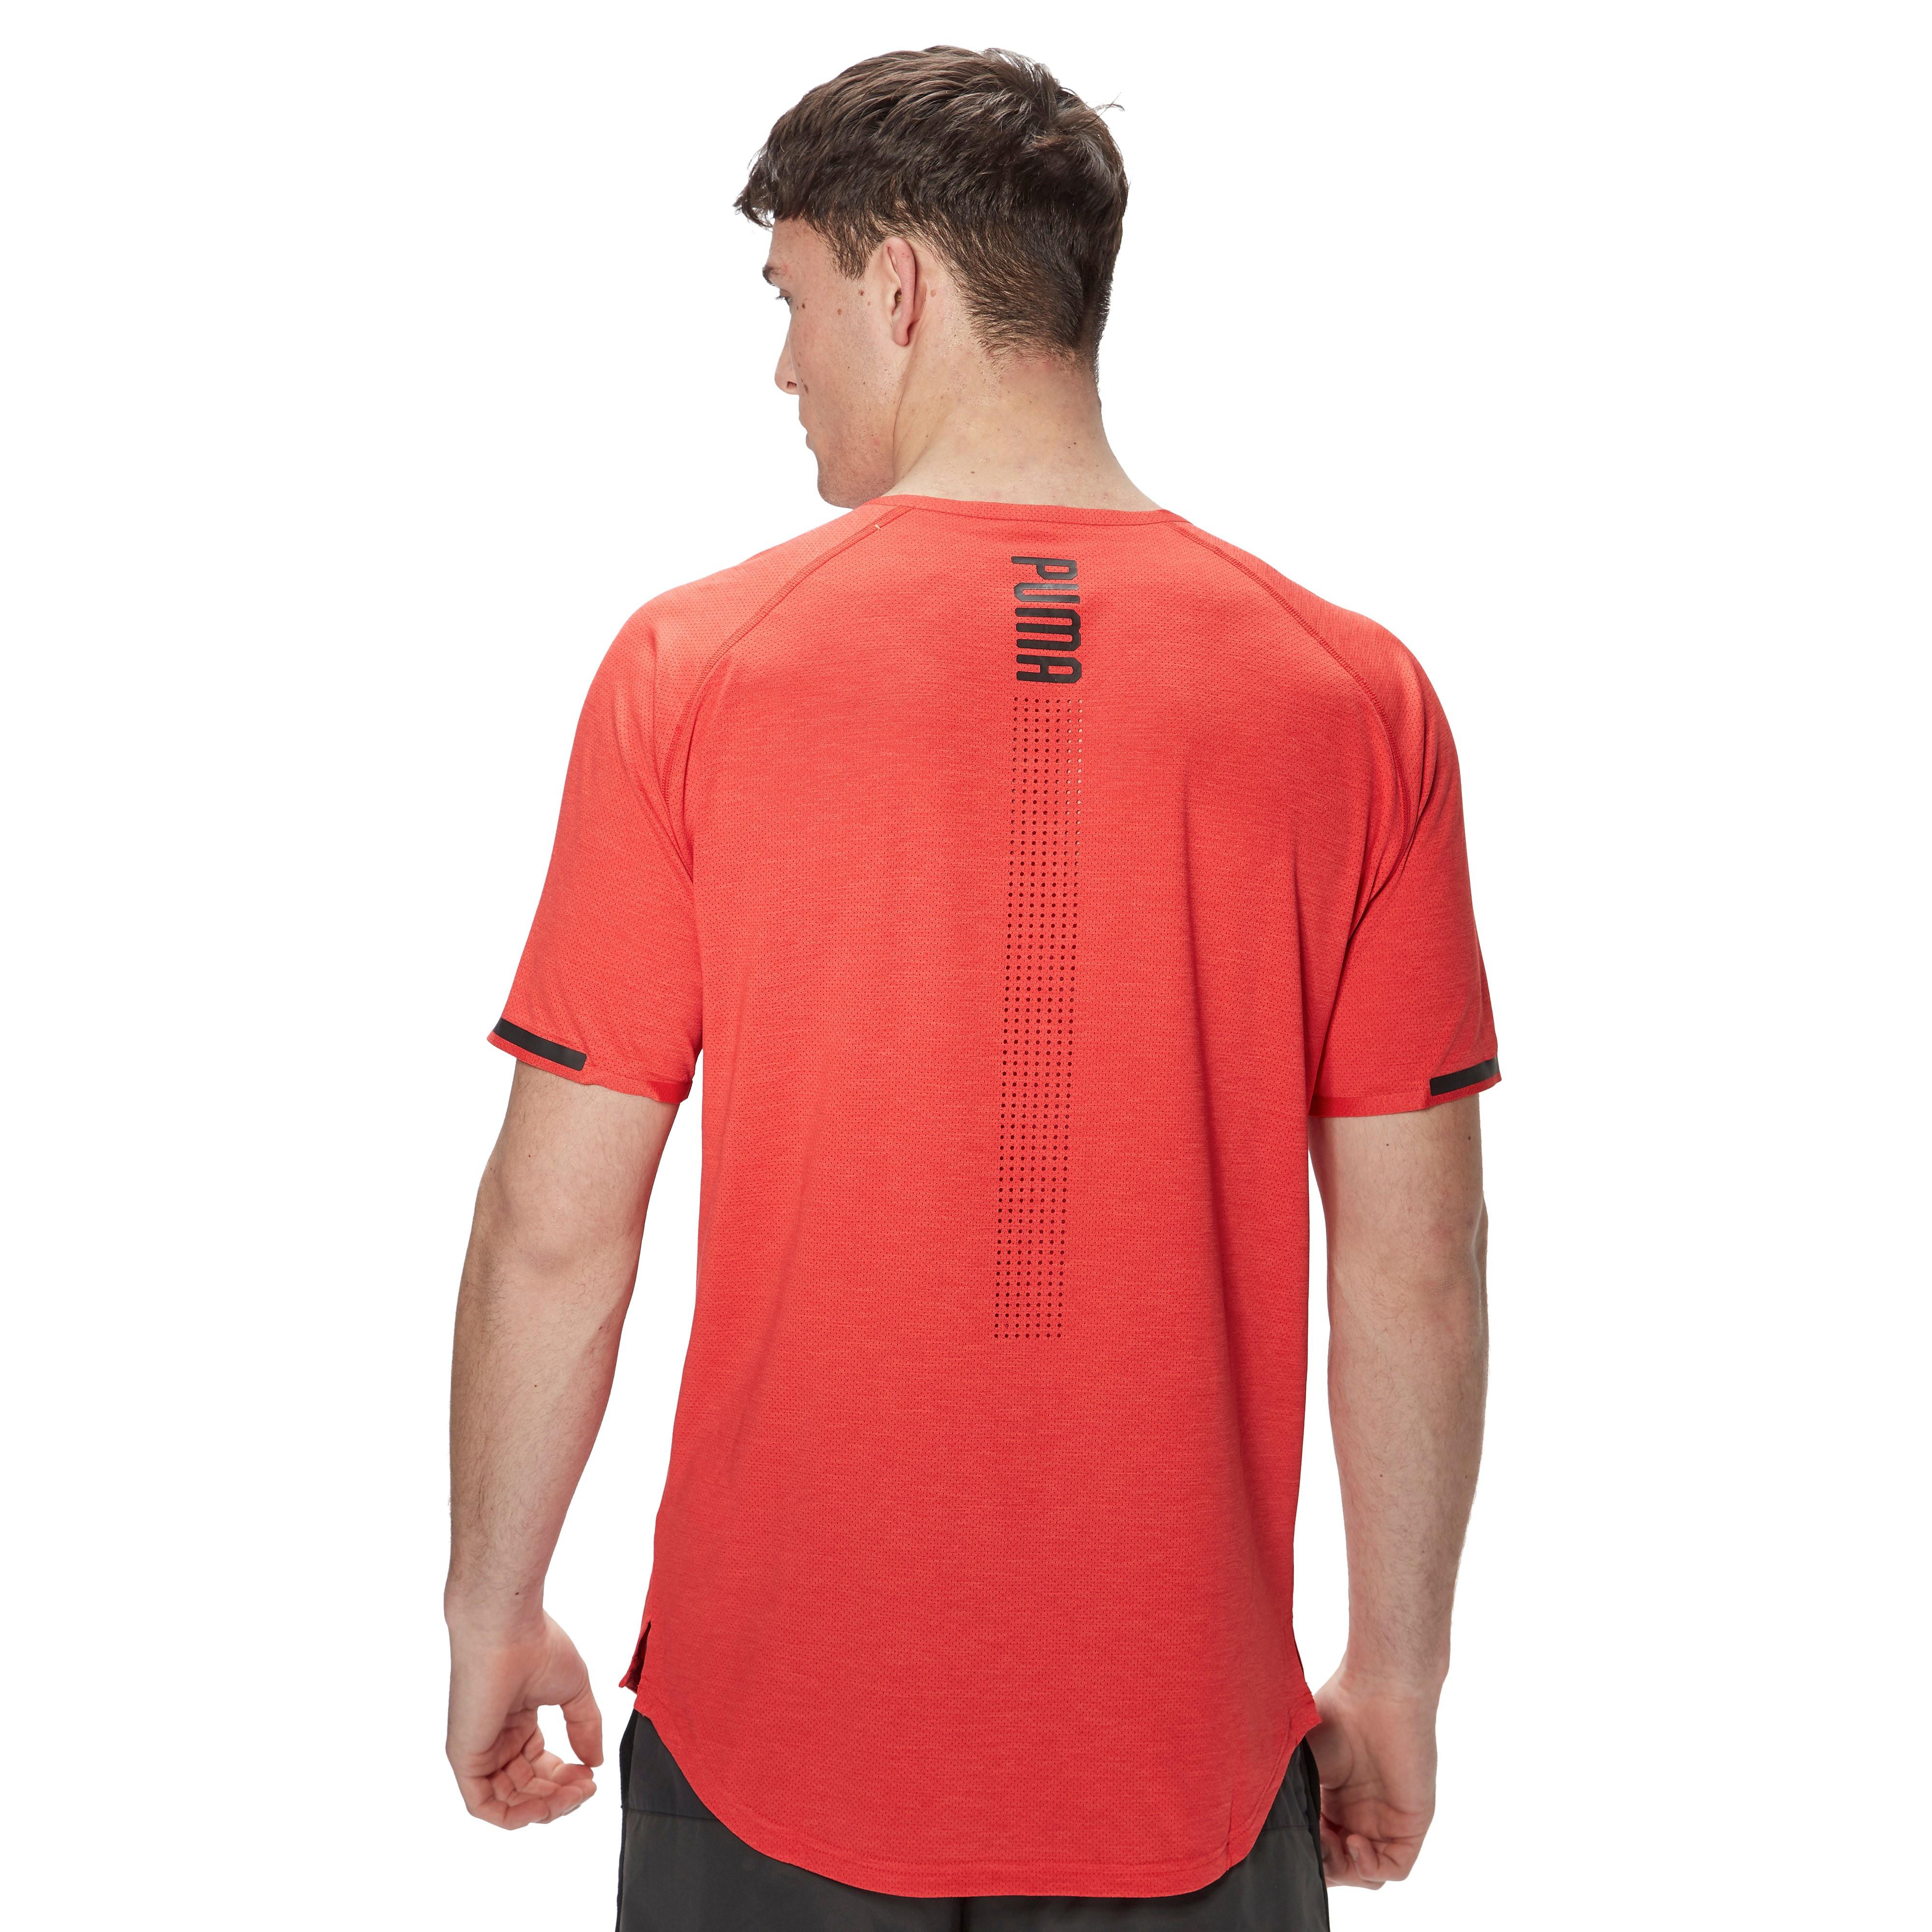 PUMA Energy Laser Men's T-Shirt